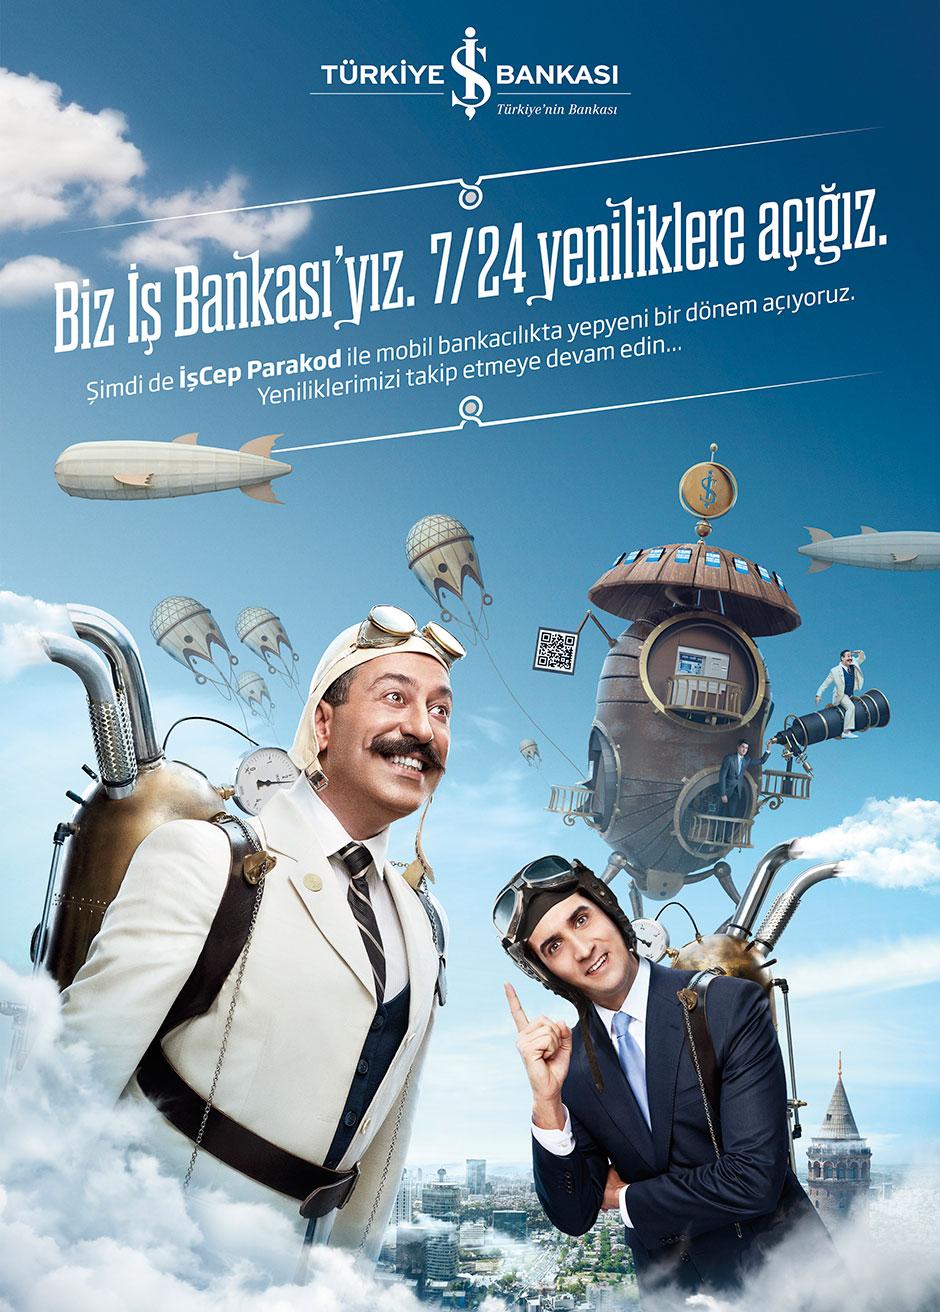 isbankasi_steampunk_PRINT